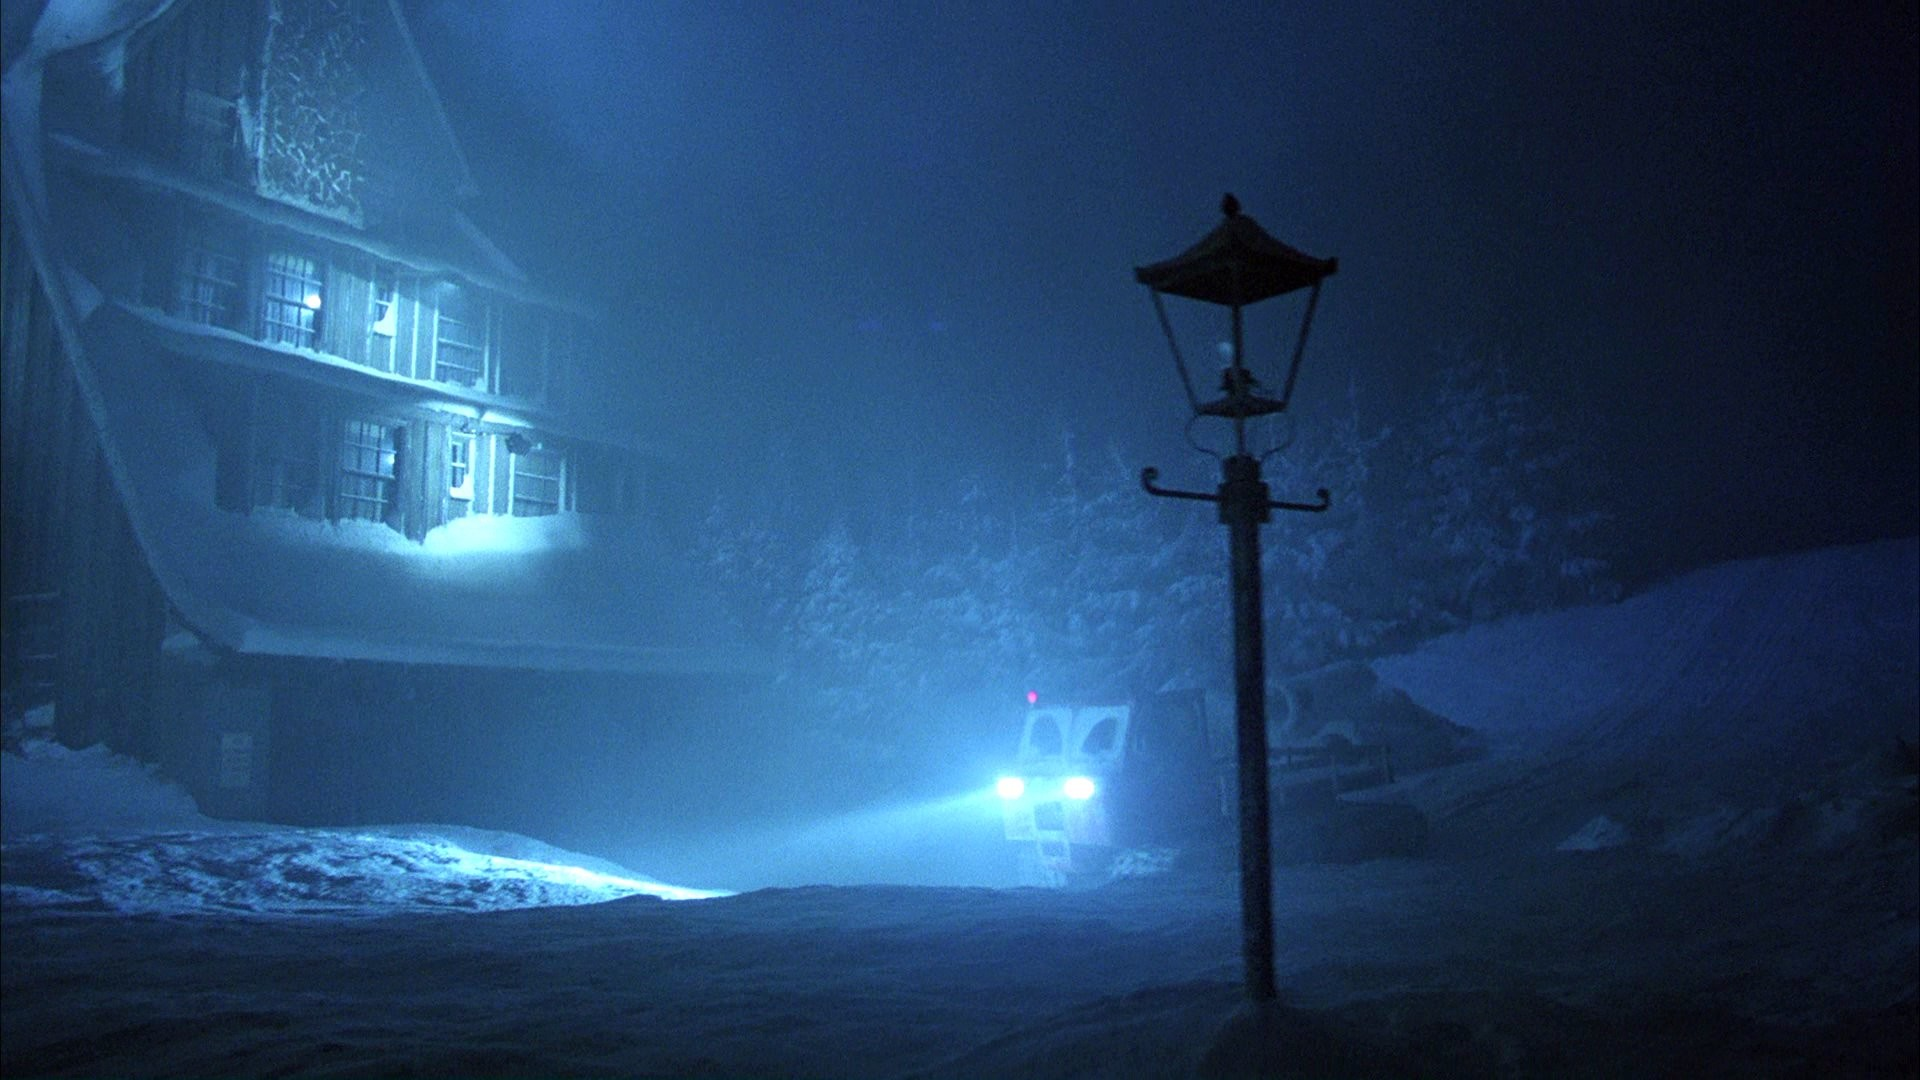 THE SHINING horror thriller dark movie film wallpaper | | 253404  | WallpaperUP